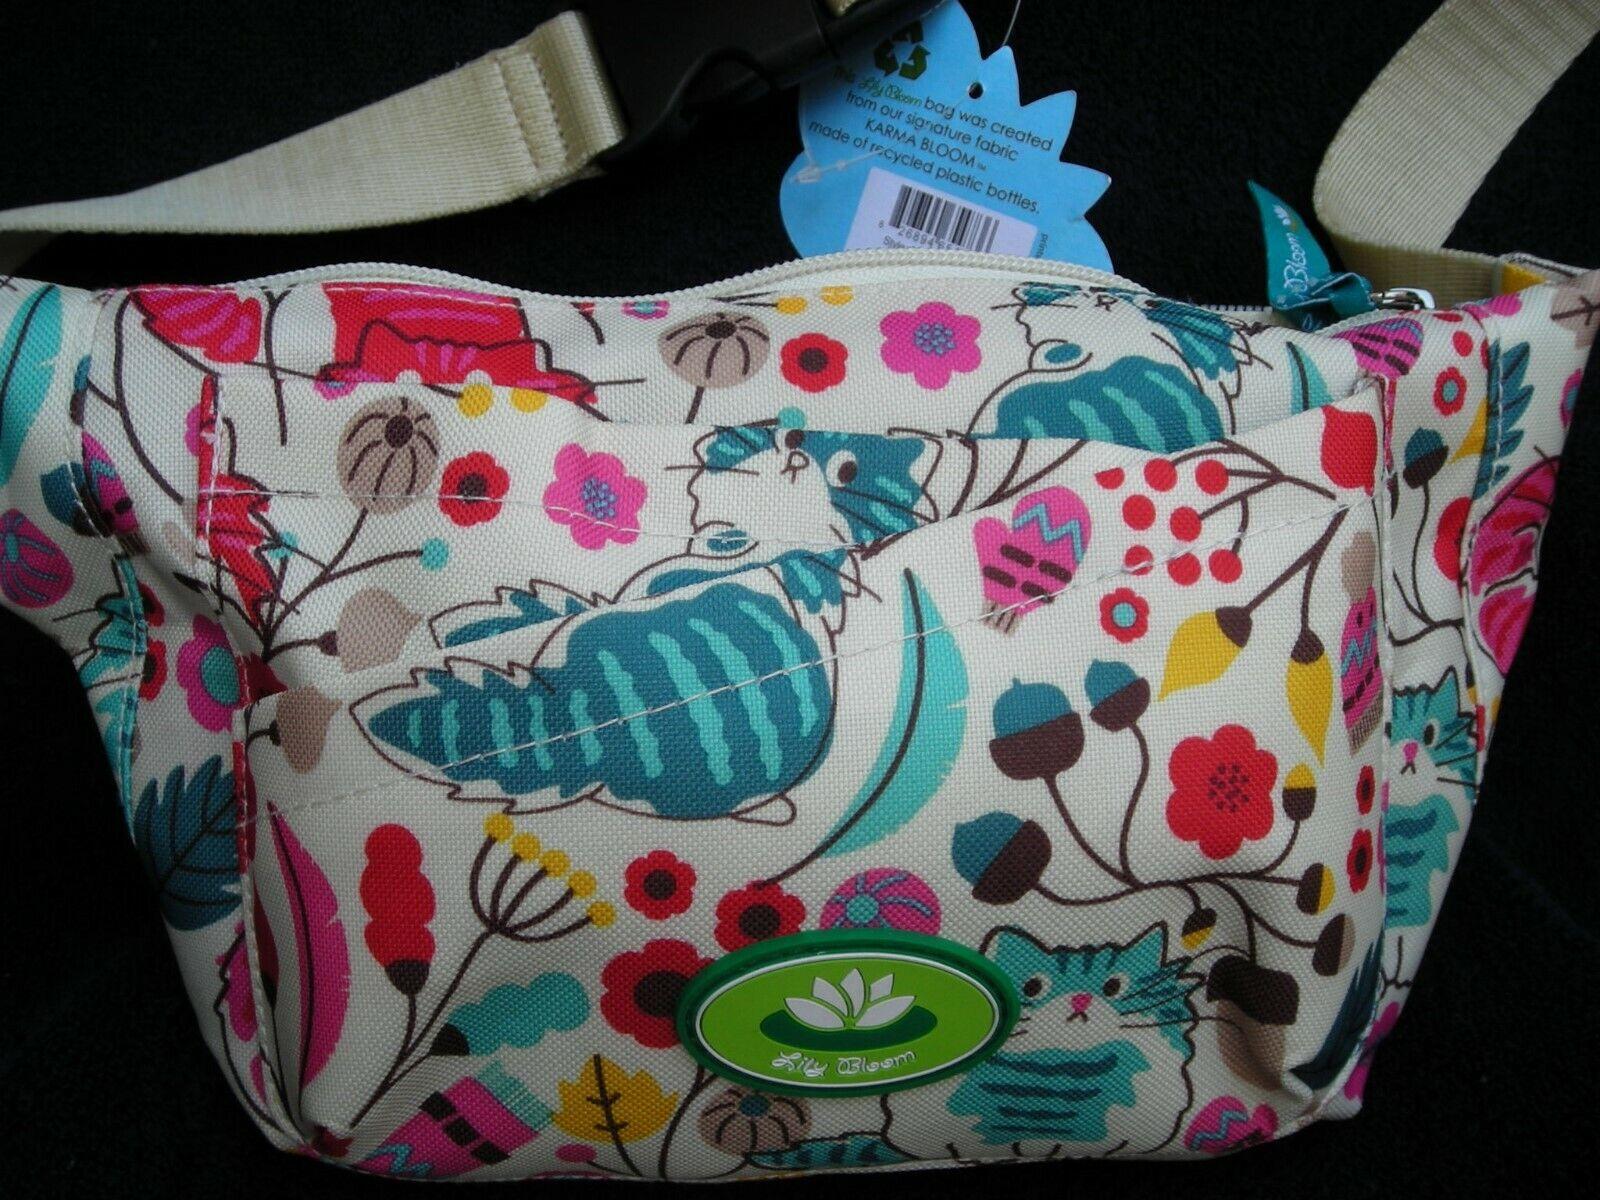 Llama Mama 3 Sport Waist Packs Fanny Pack Adjustable For Travel